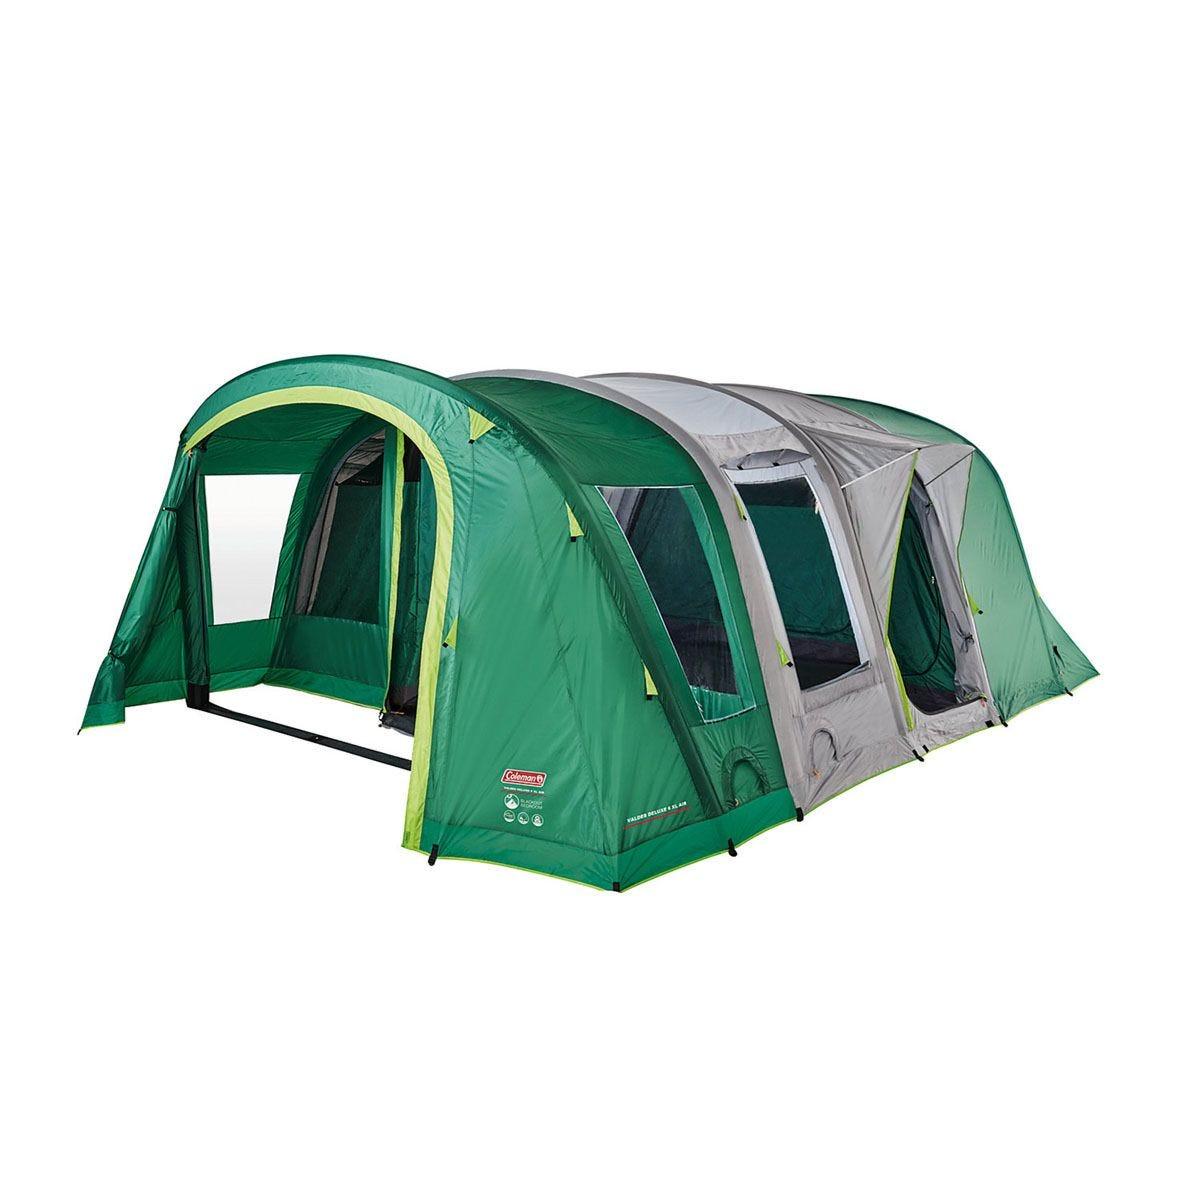 Coleman Valdes Deluxe 6 XL Tent - Green